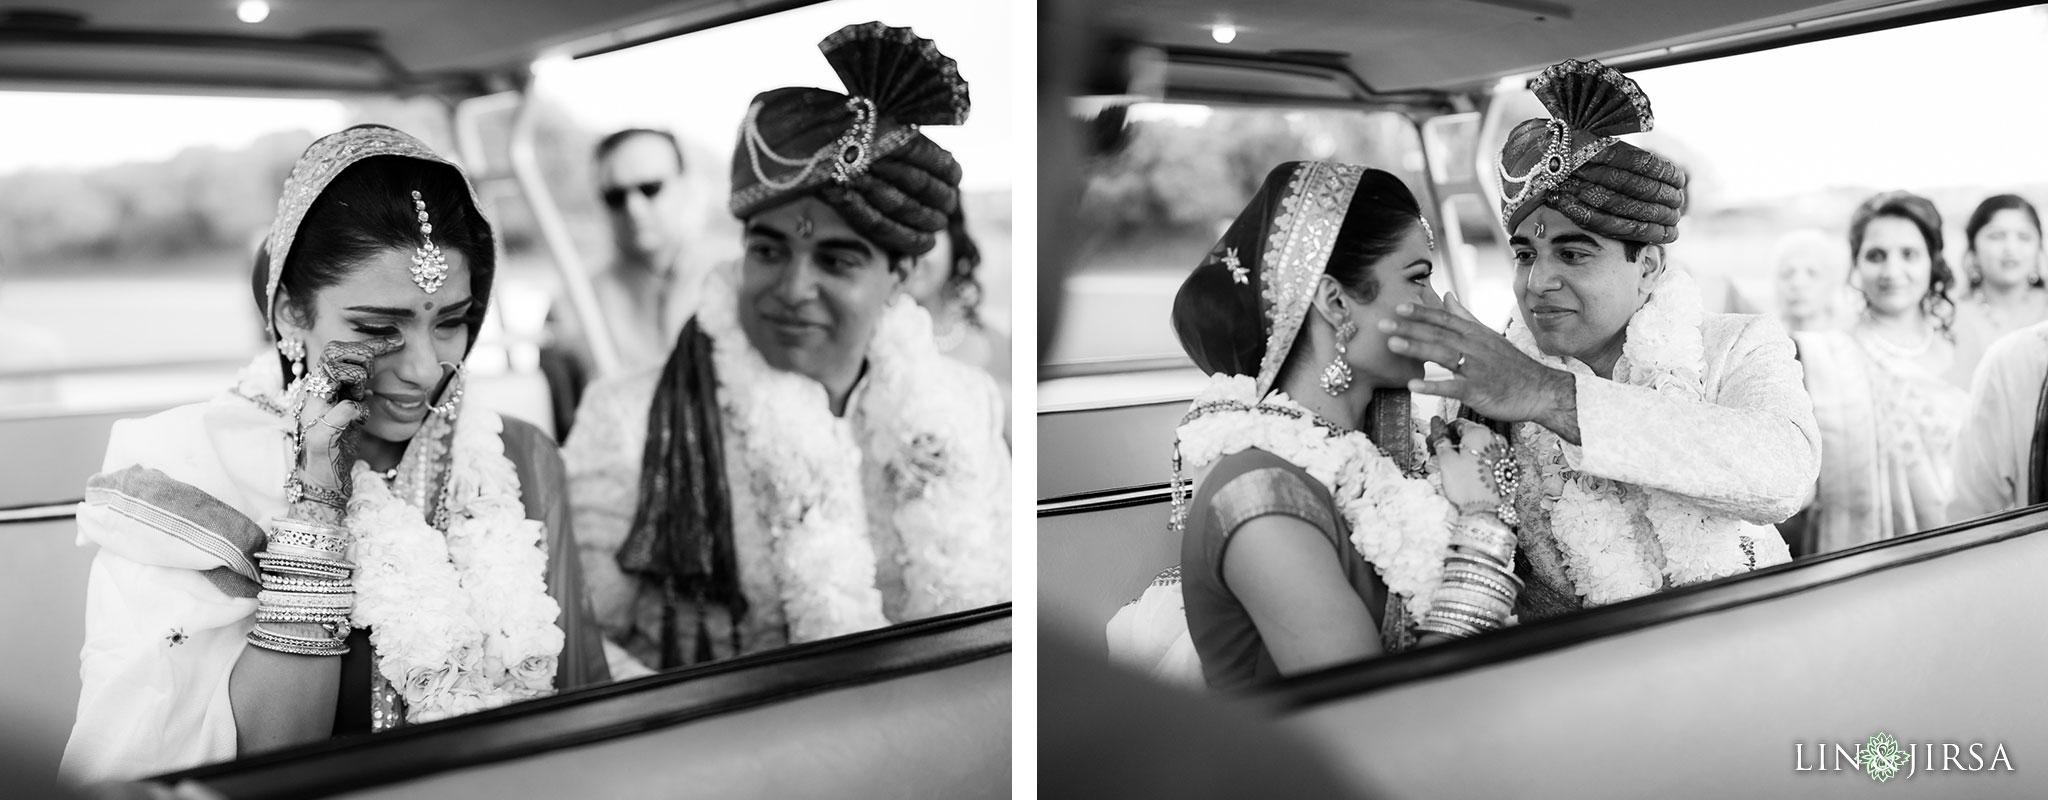 3 ritz carlton laguna niguel indian wedding ceremony vidhai photography